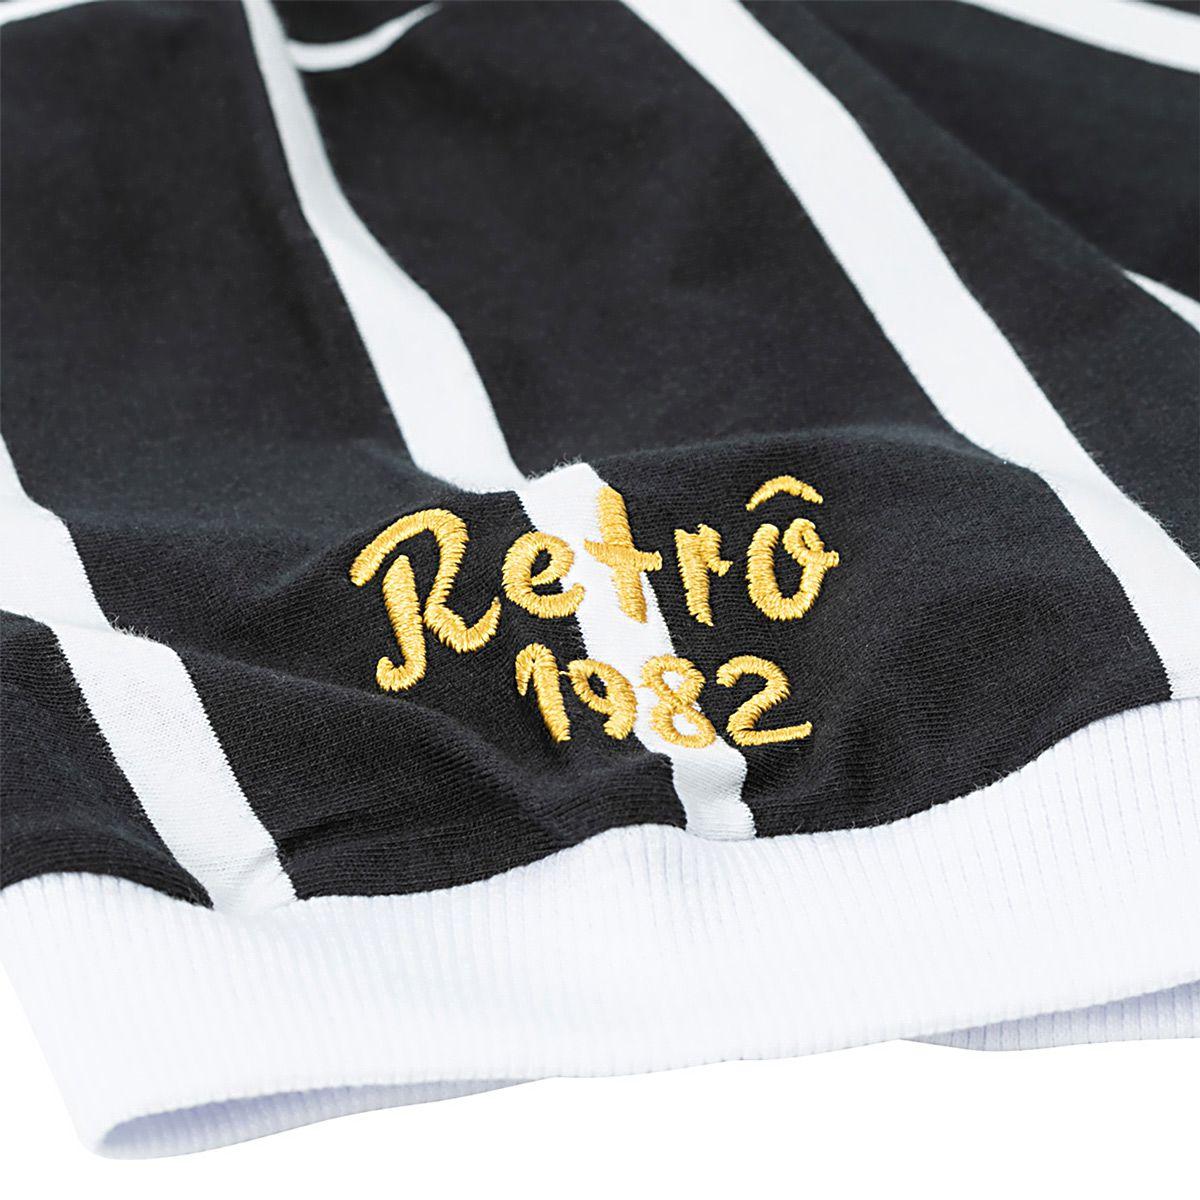 Camisa Plus Size Retrô Corinthians Democracia 1982 Masculina